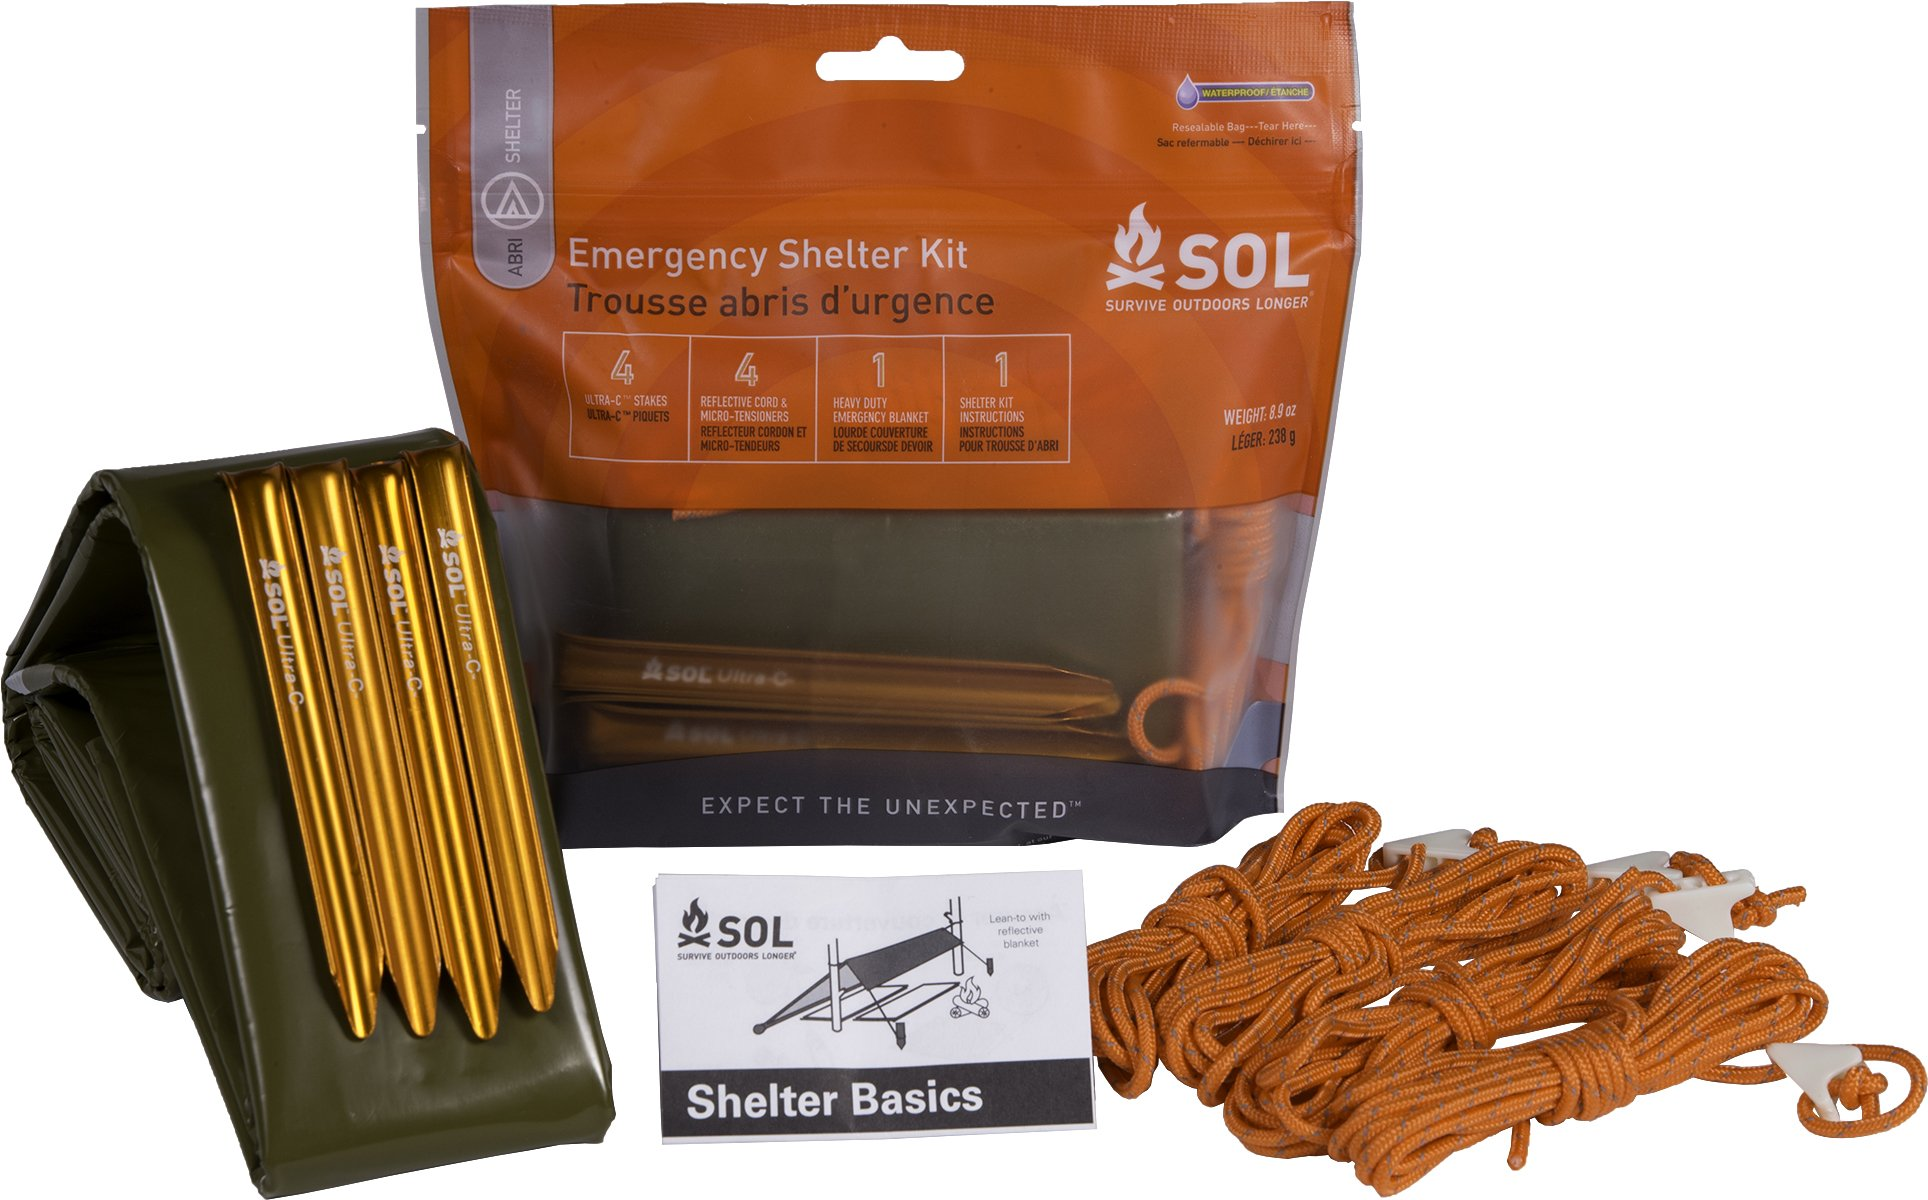 Adventure Medical Emergency Shelter Kit